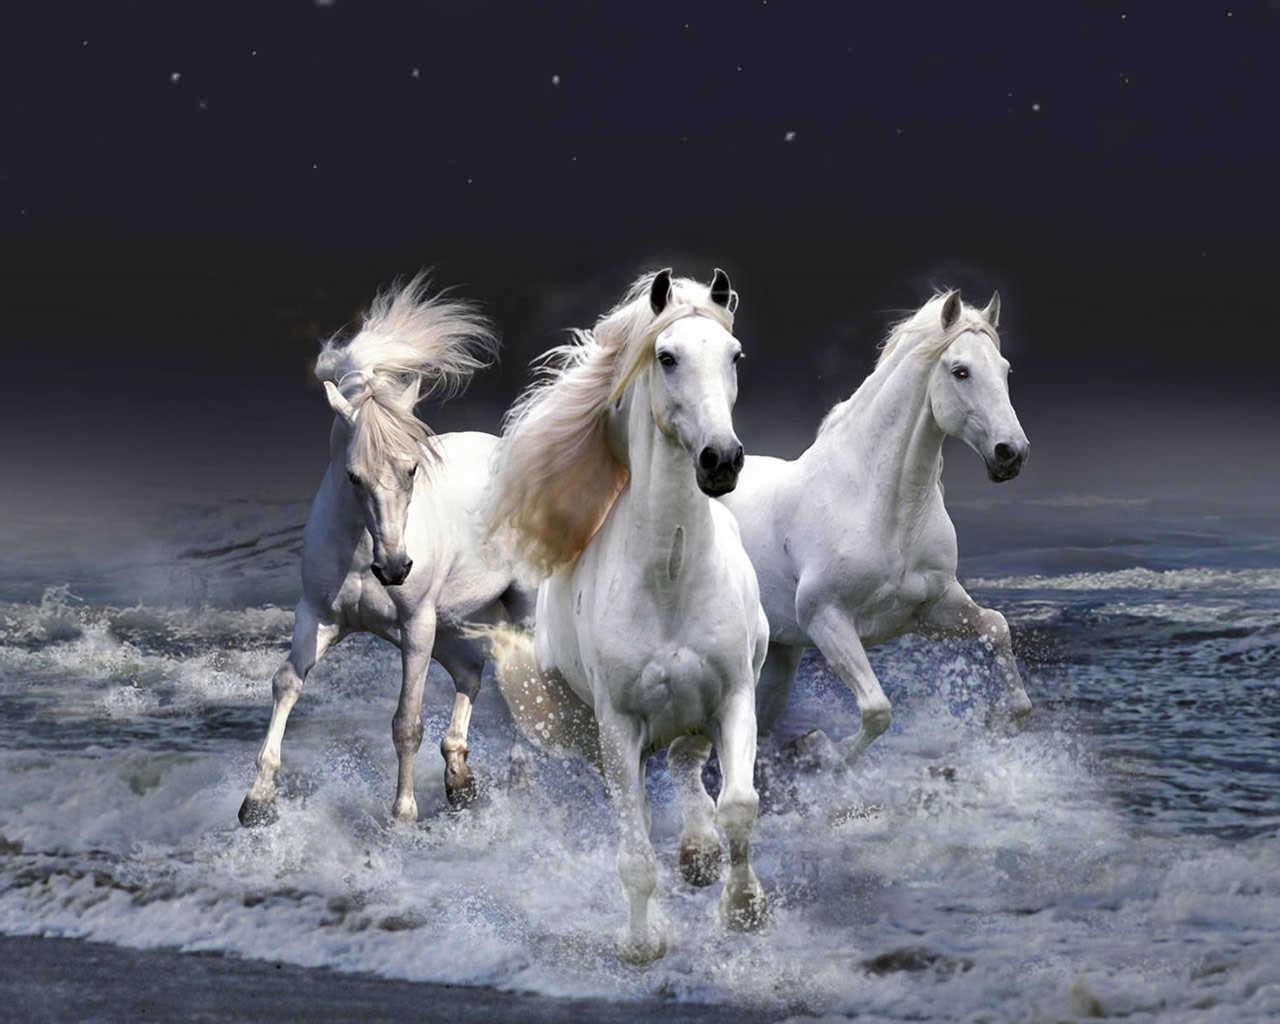 Running Horses Wallpaper   Screensavers   Animals Wallpapers 1280x1024